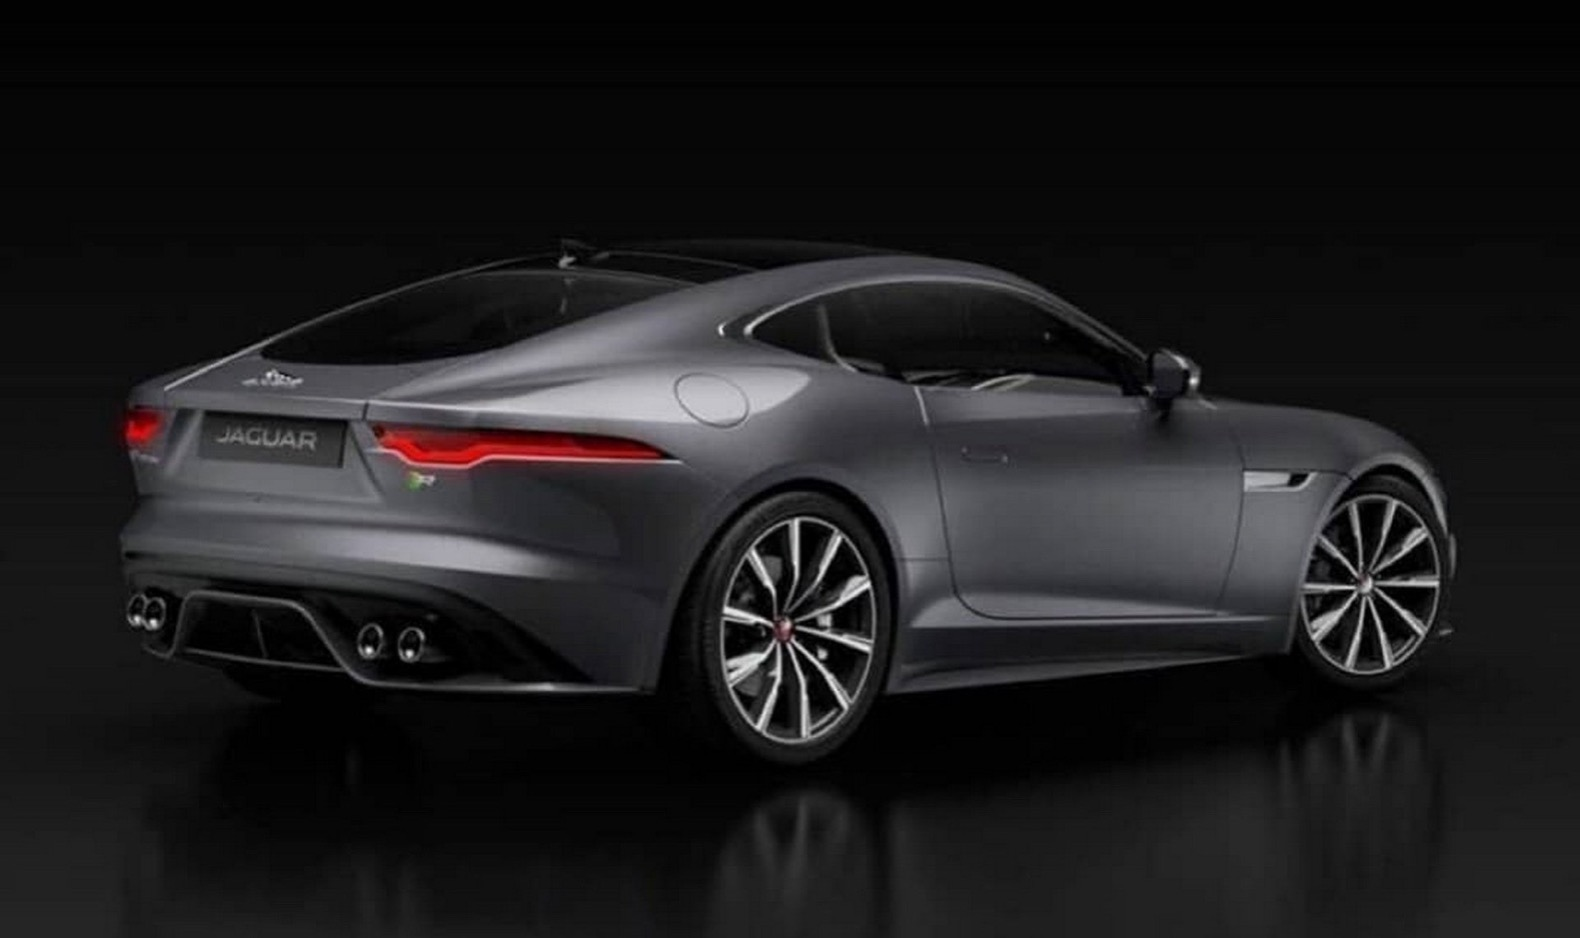 2021 jaguar f-type leaked | the torque report